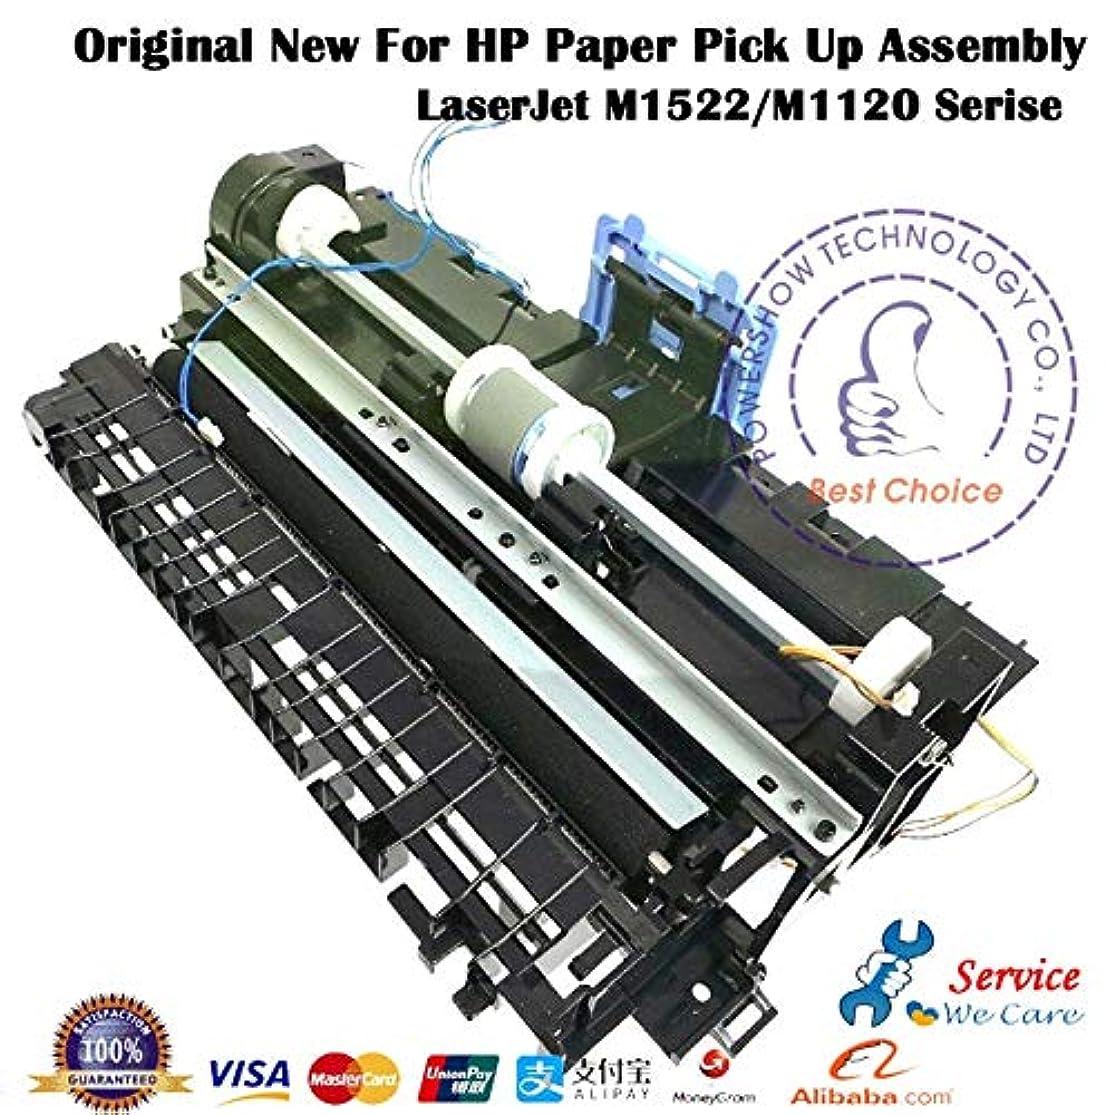 Printer Parts Original New RM1-4730 RM1-4730-000CN Paper Pick Up Roller Assembly HP M1522 M1120 P1505 HP1522 HP1120 HP1505 Serise jyxbwzpl2